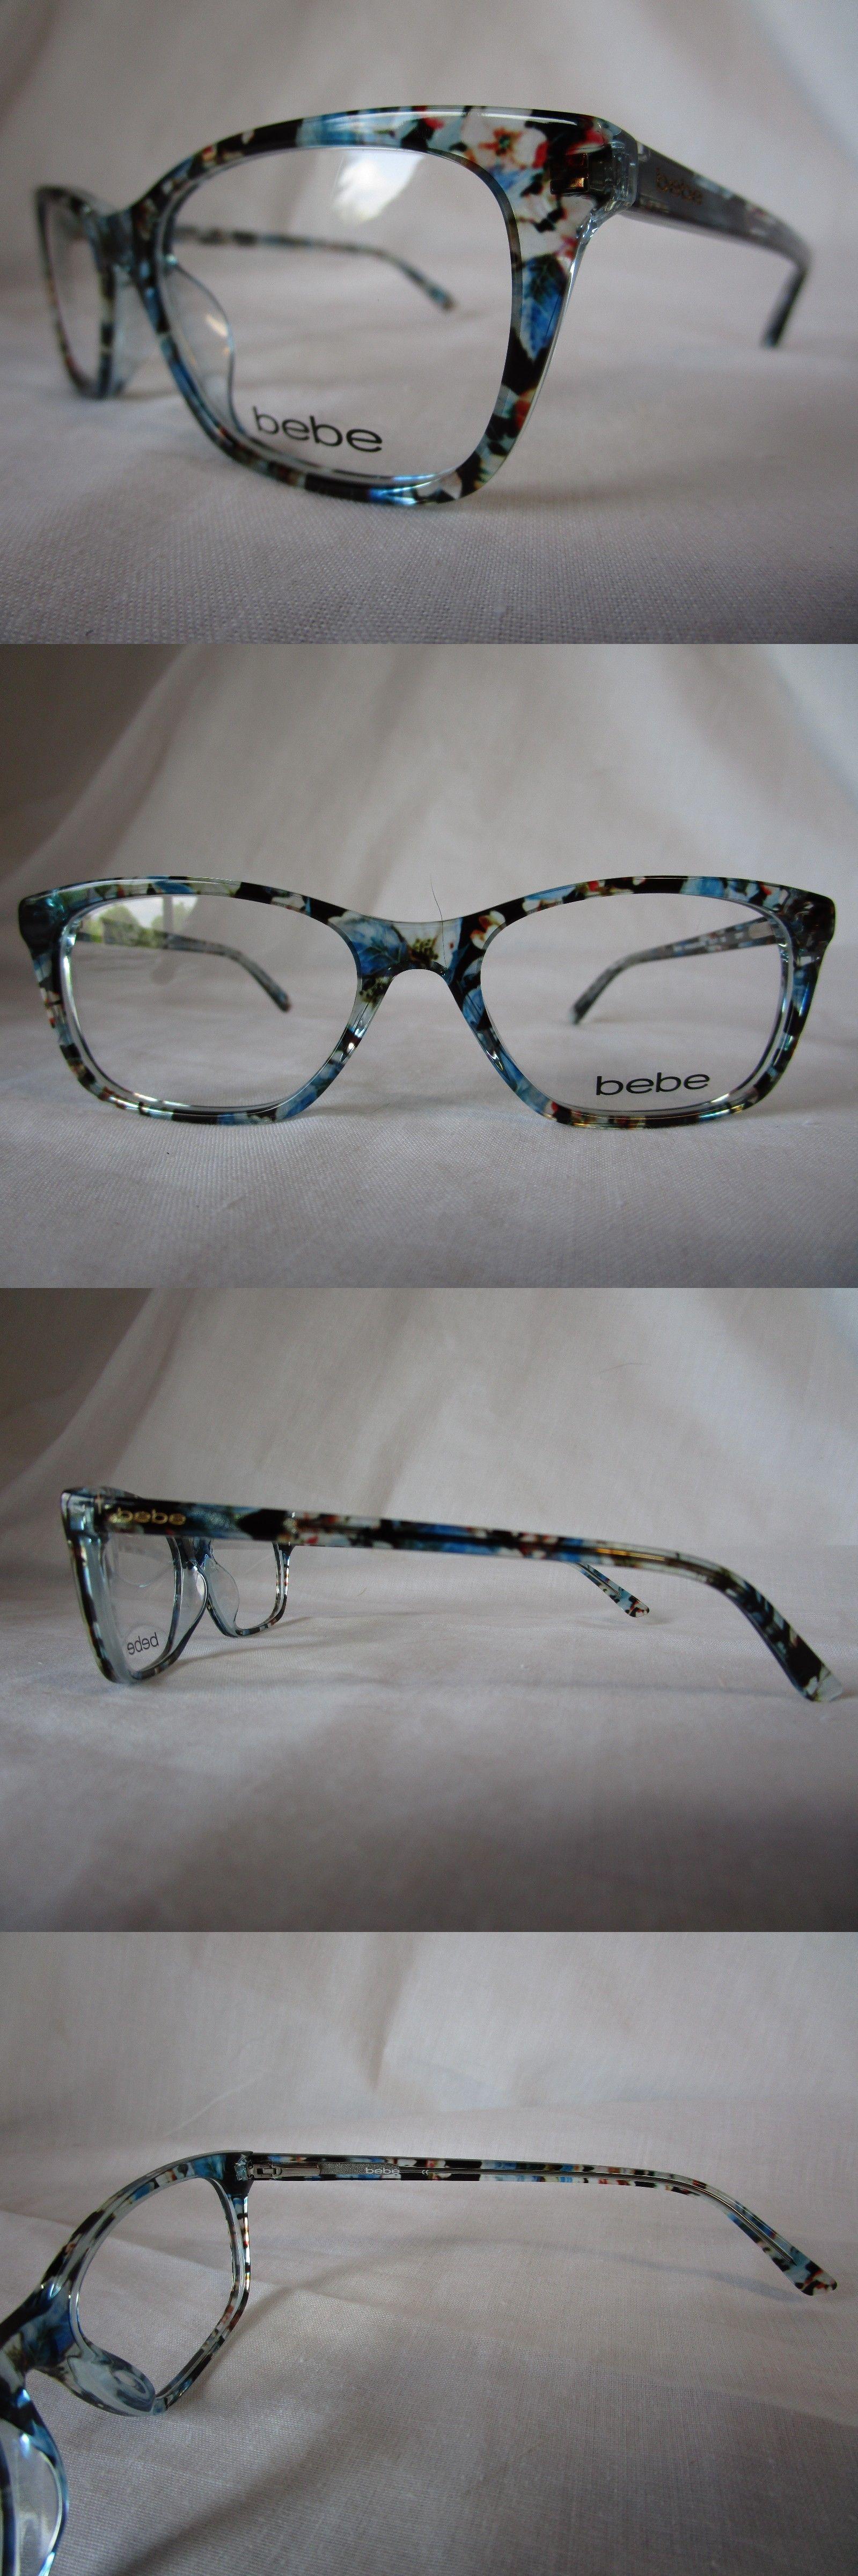 59f0a54948b7 Eyeglass Frames 180957  Bebe Eyeglass Frame Bb5145 400 Blue Floral  Transparent 53-17-